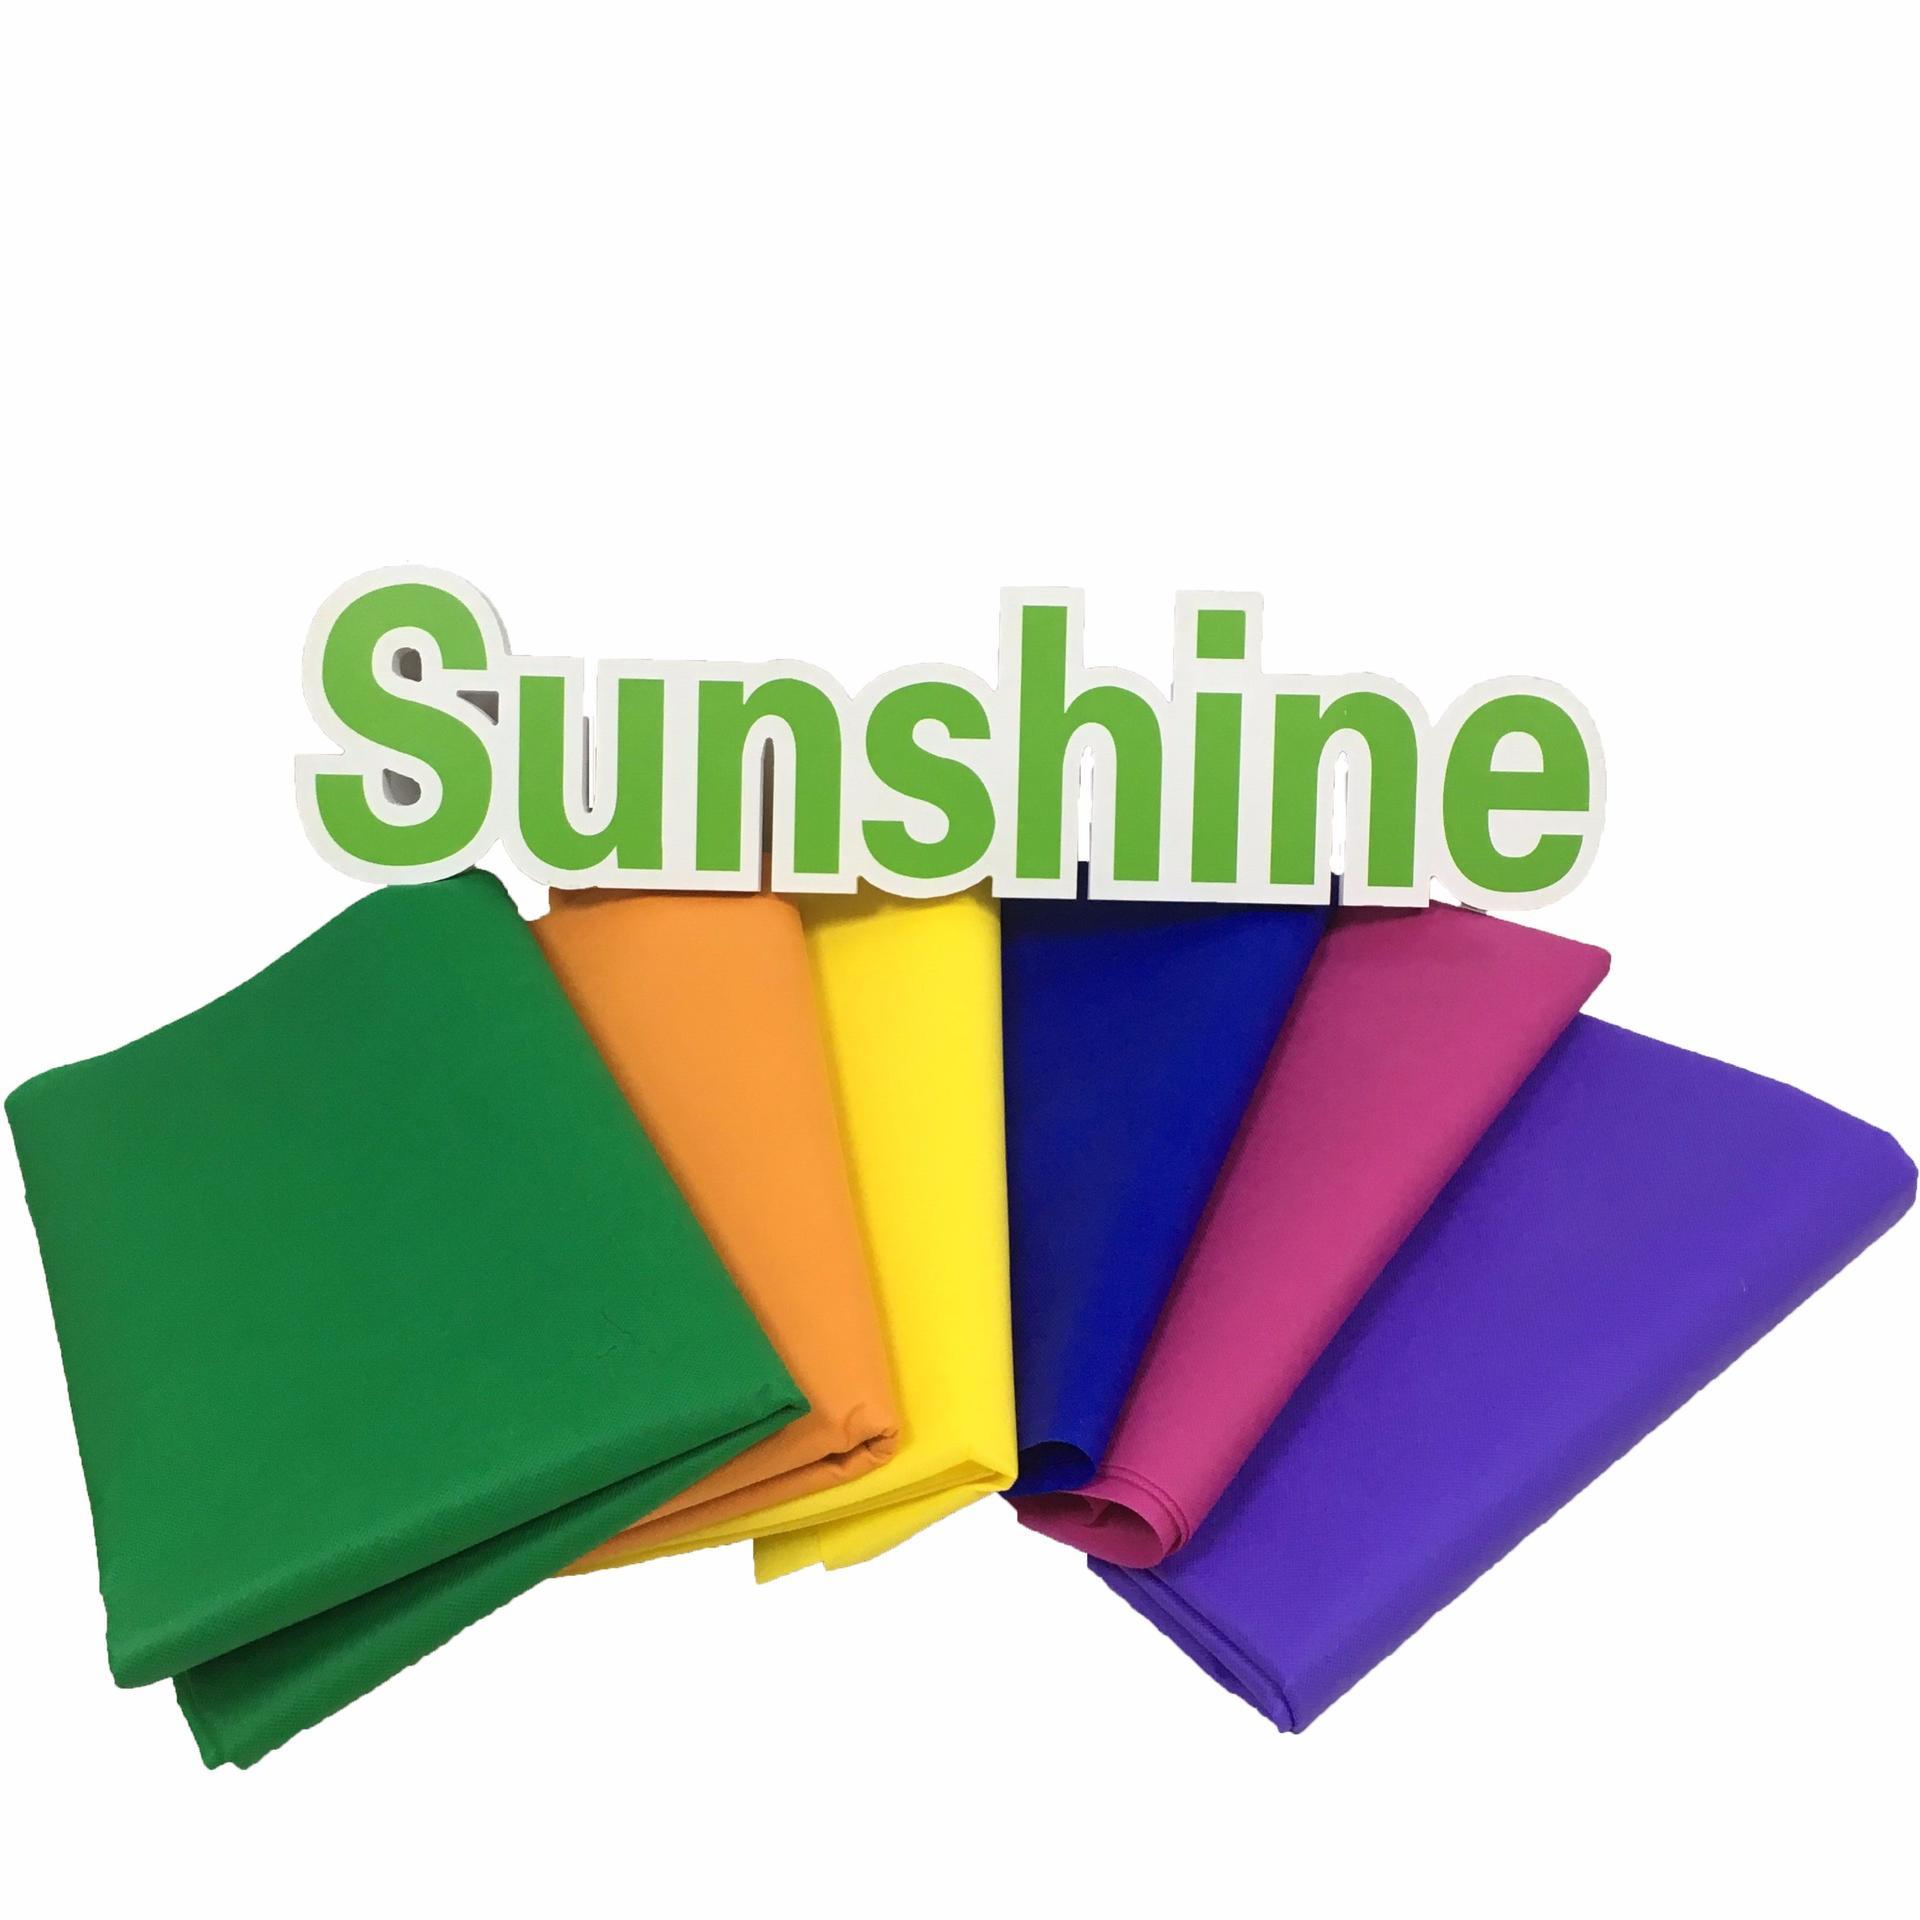 TNT Fabric(PP Spunbond Nonwoven Fabric